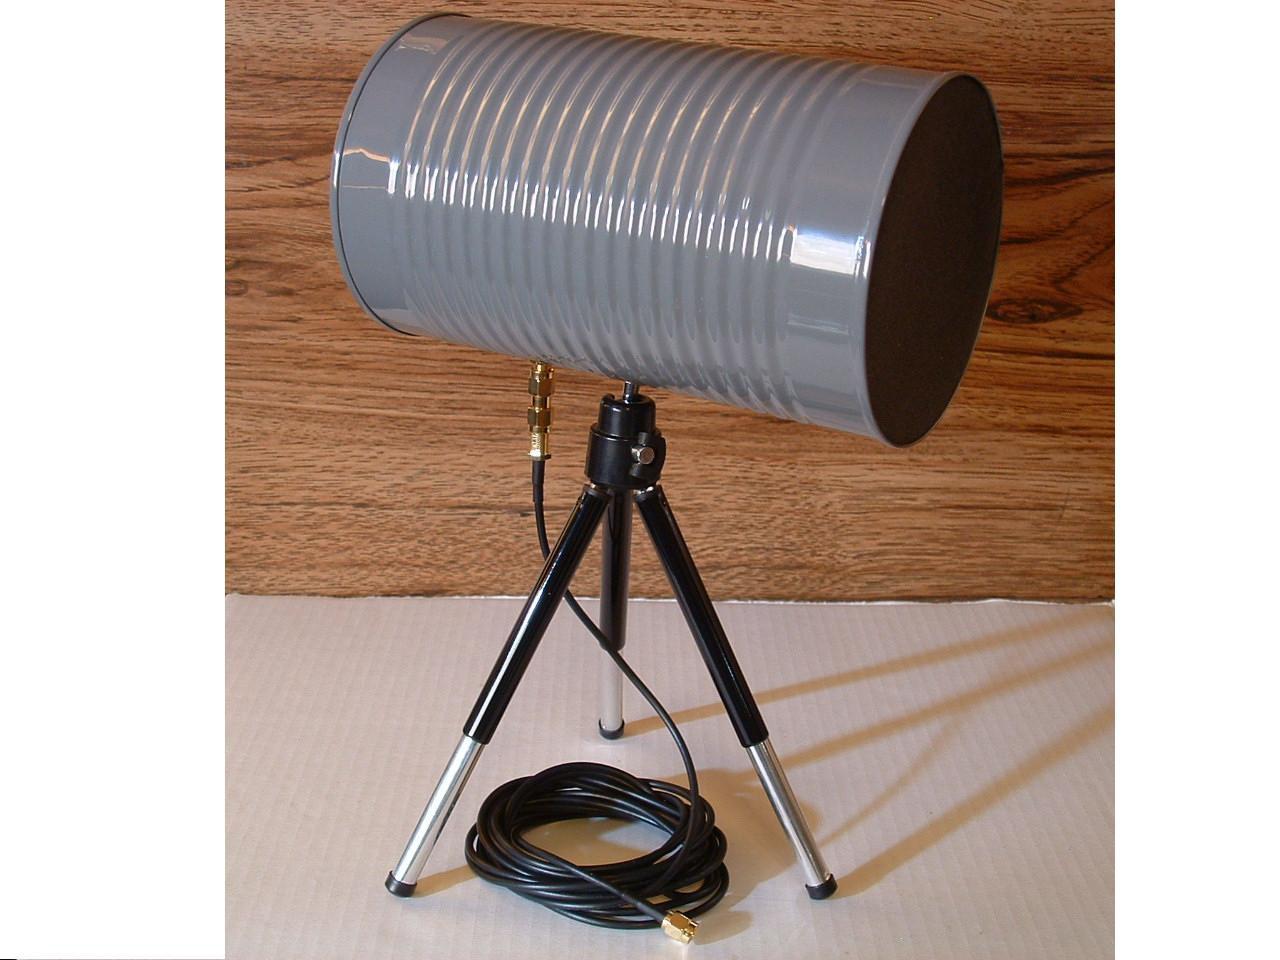 Wifi Cantenna Directional Long Range Signal Boosting